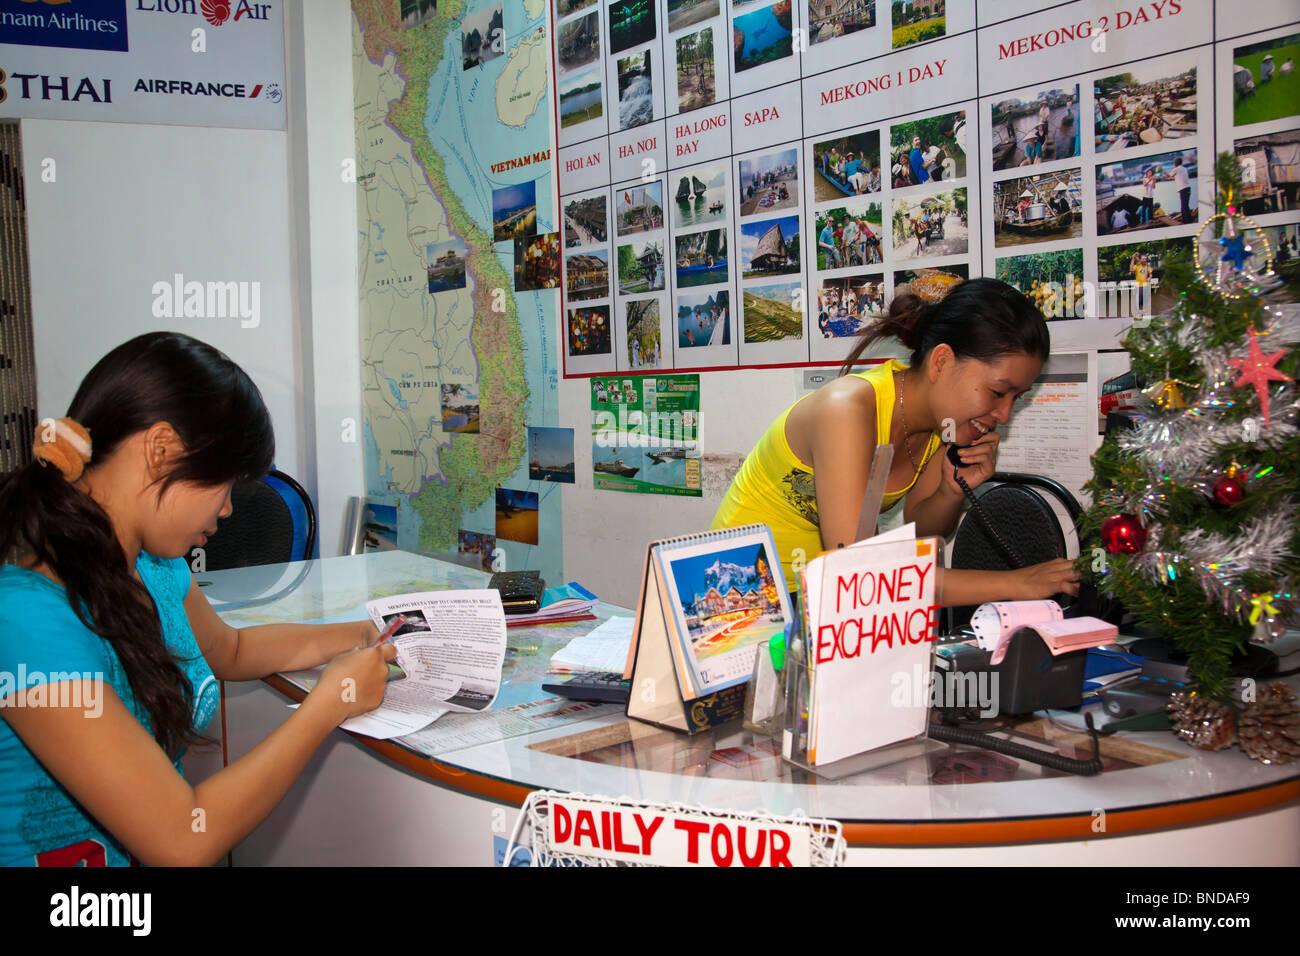 Vietnamese travel agent tour office travel information - Stock Image